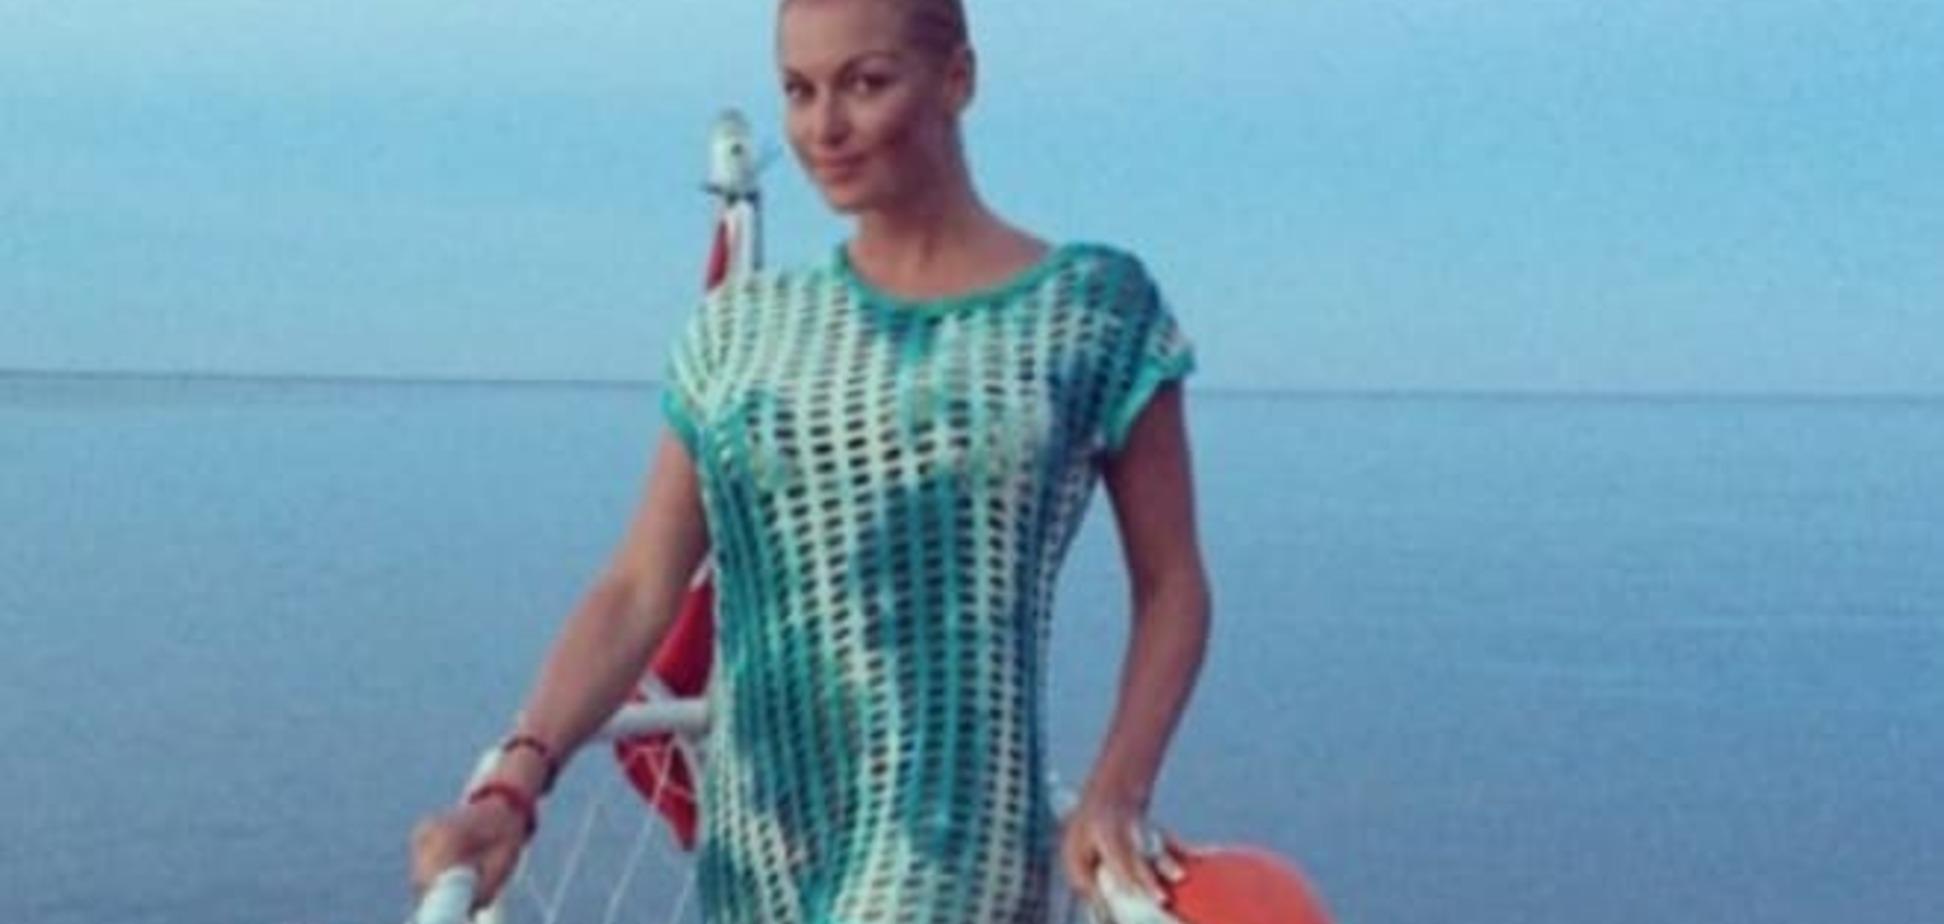 Бог на небе, а Россия на земле: Волочкова в Крыму 'тусила' с путинскими байкерами